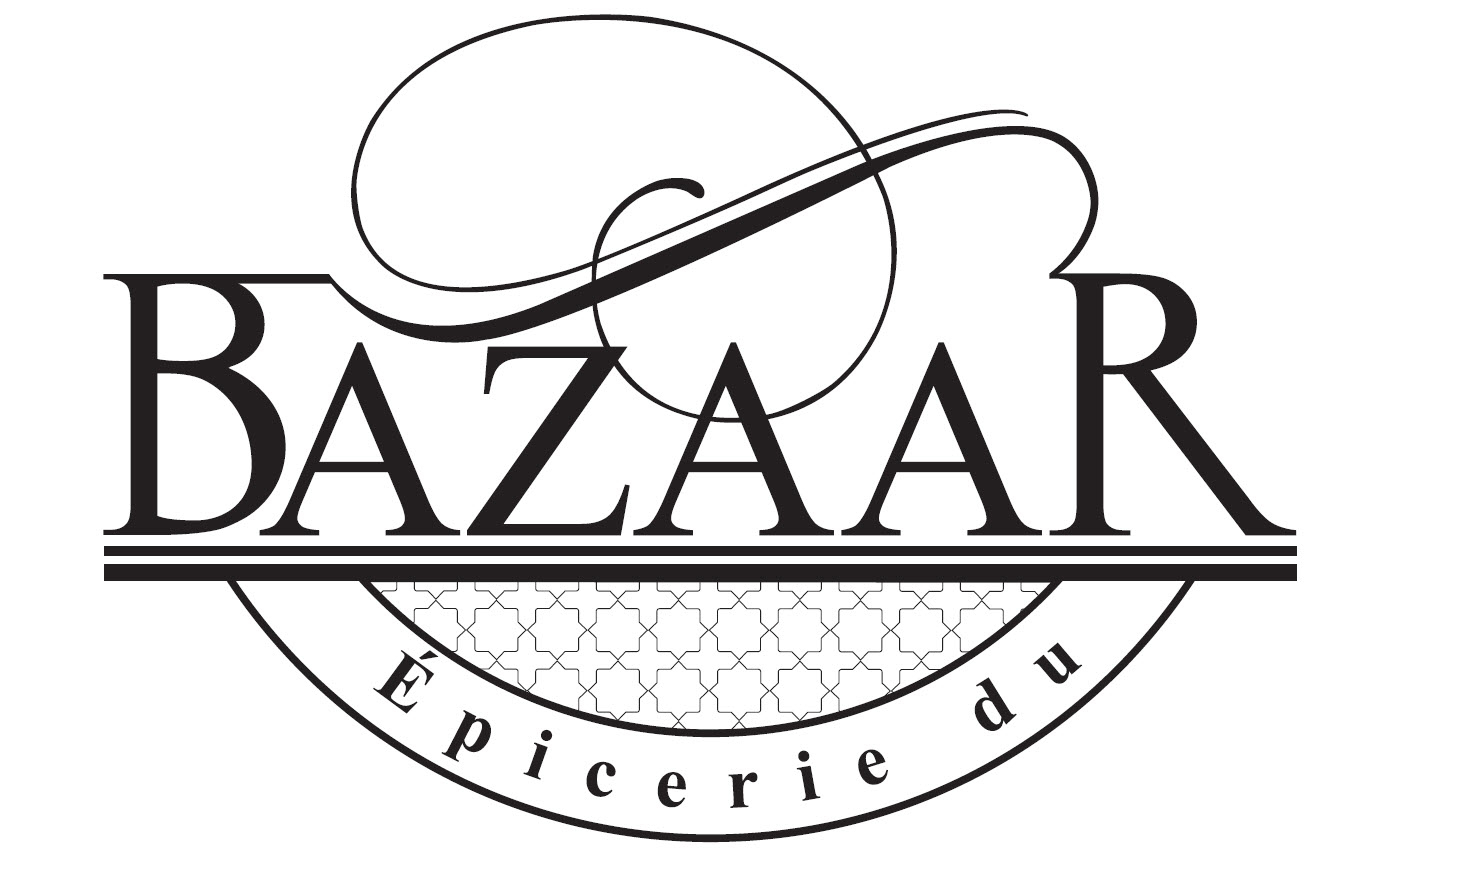 Épicerie du Bazaar